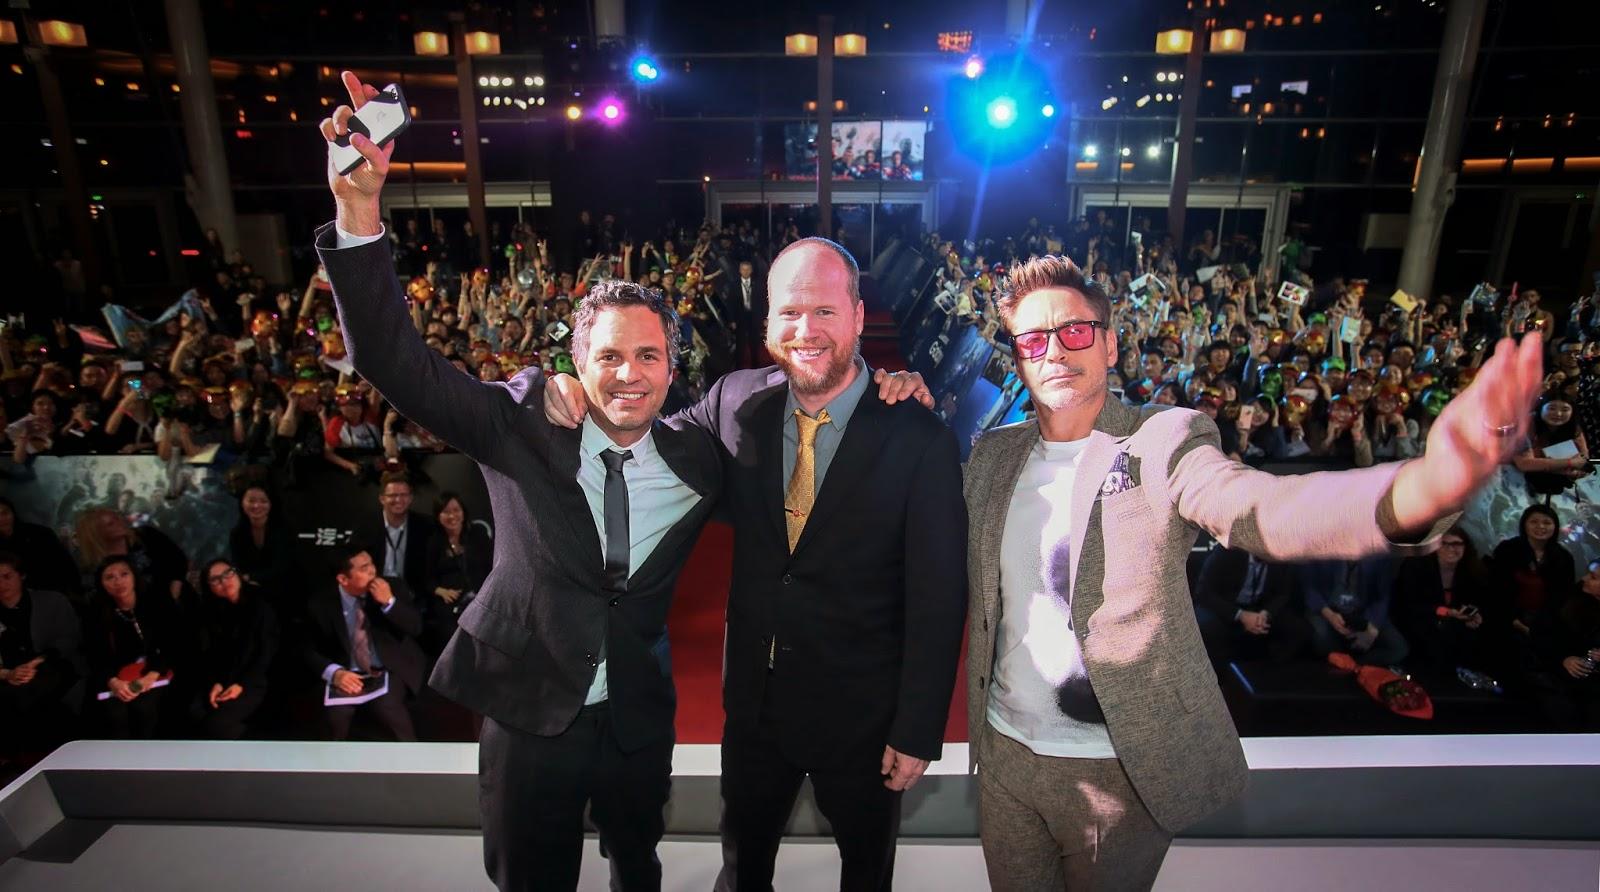 Mark Ruffalo, Joss Whedon and Robert Downey Jr.